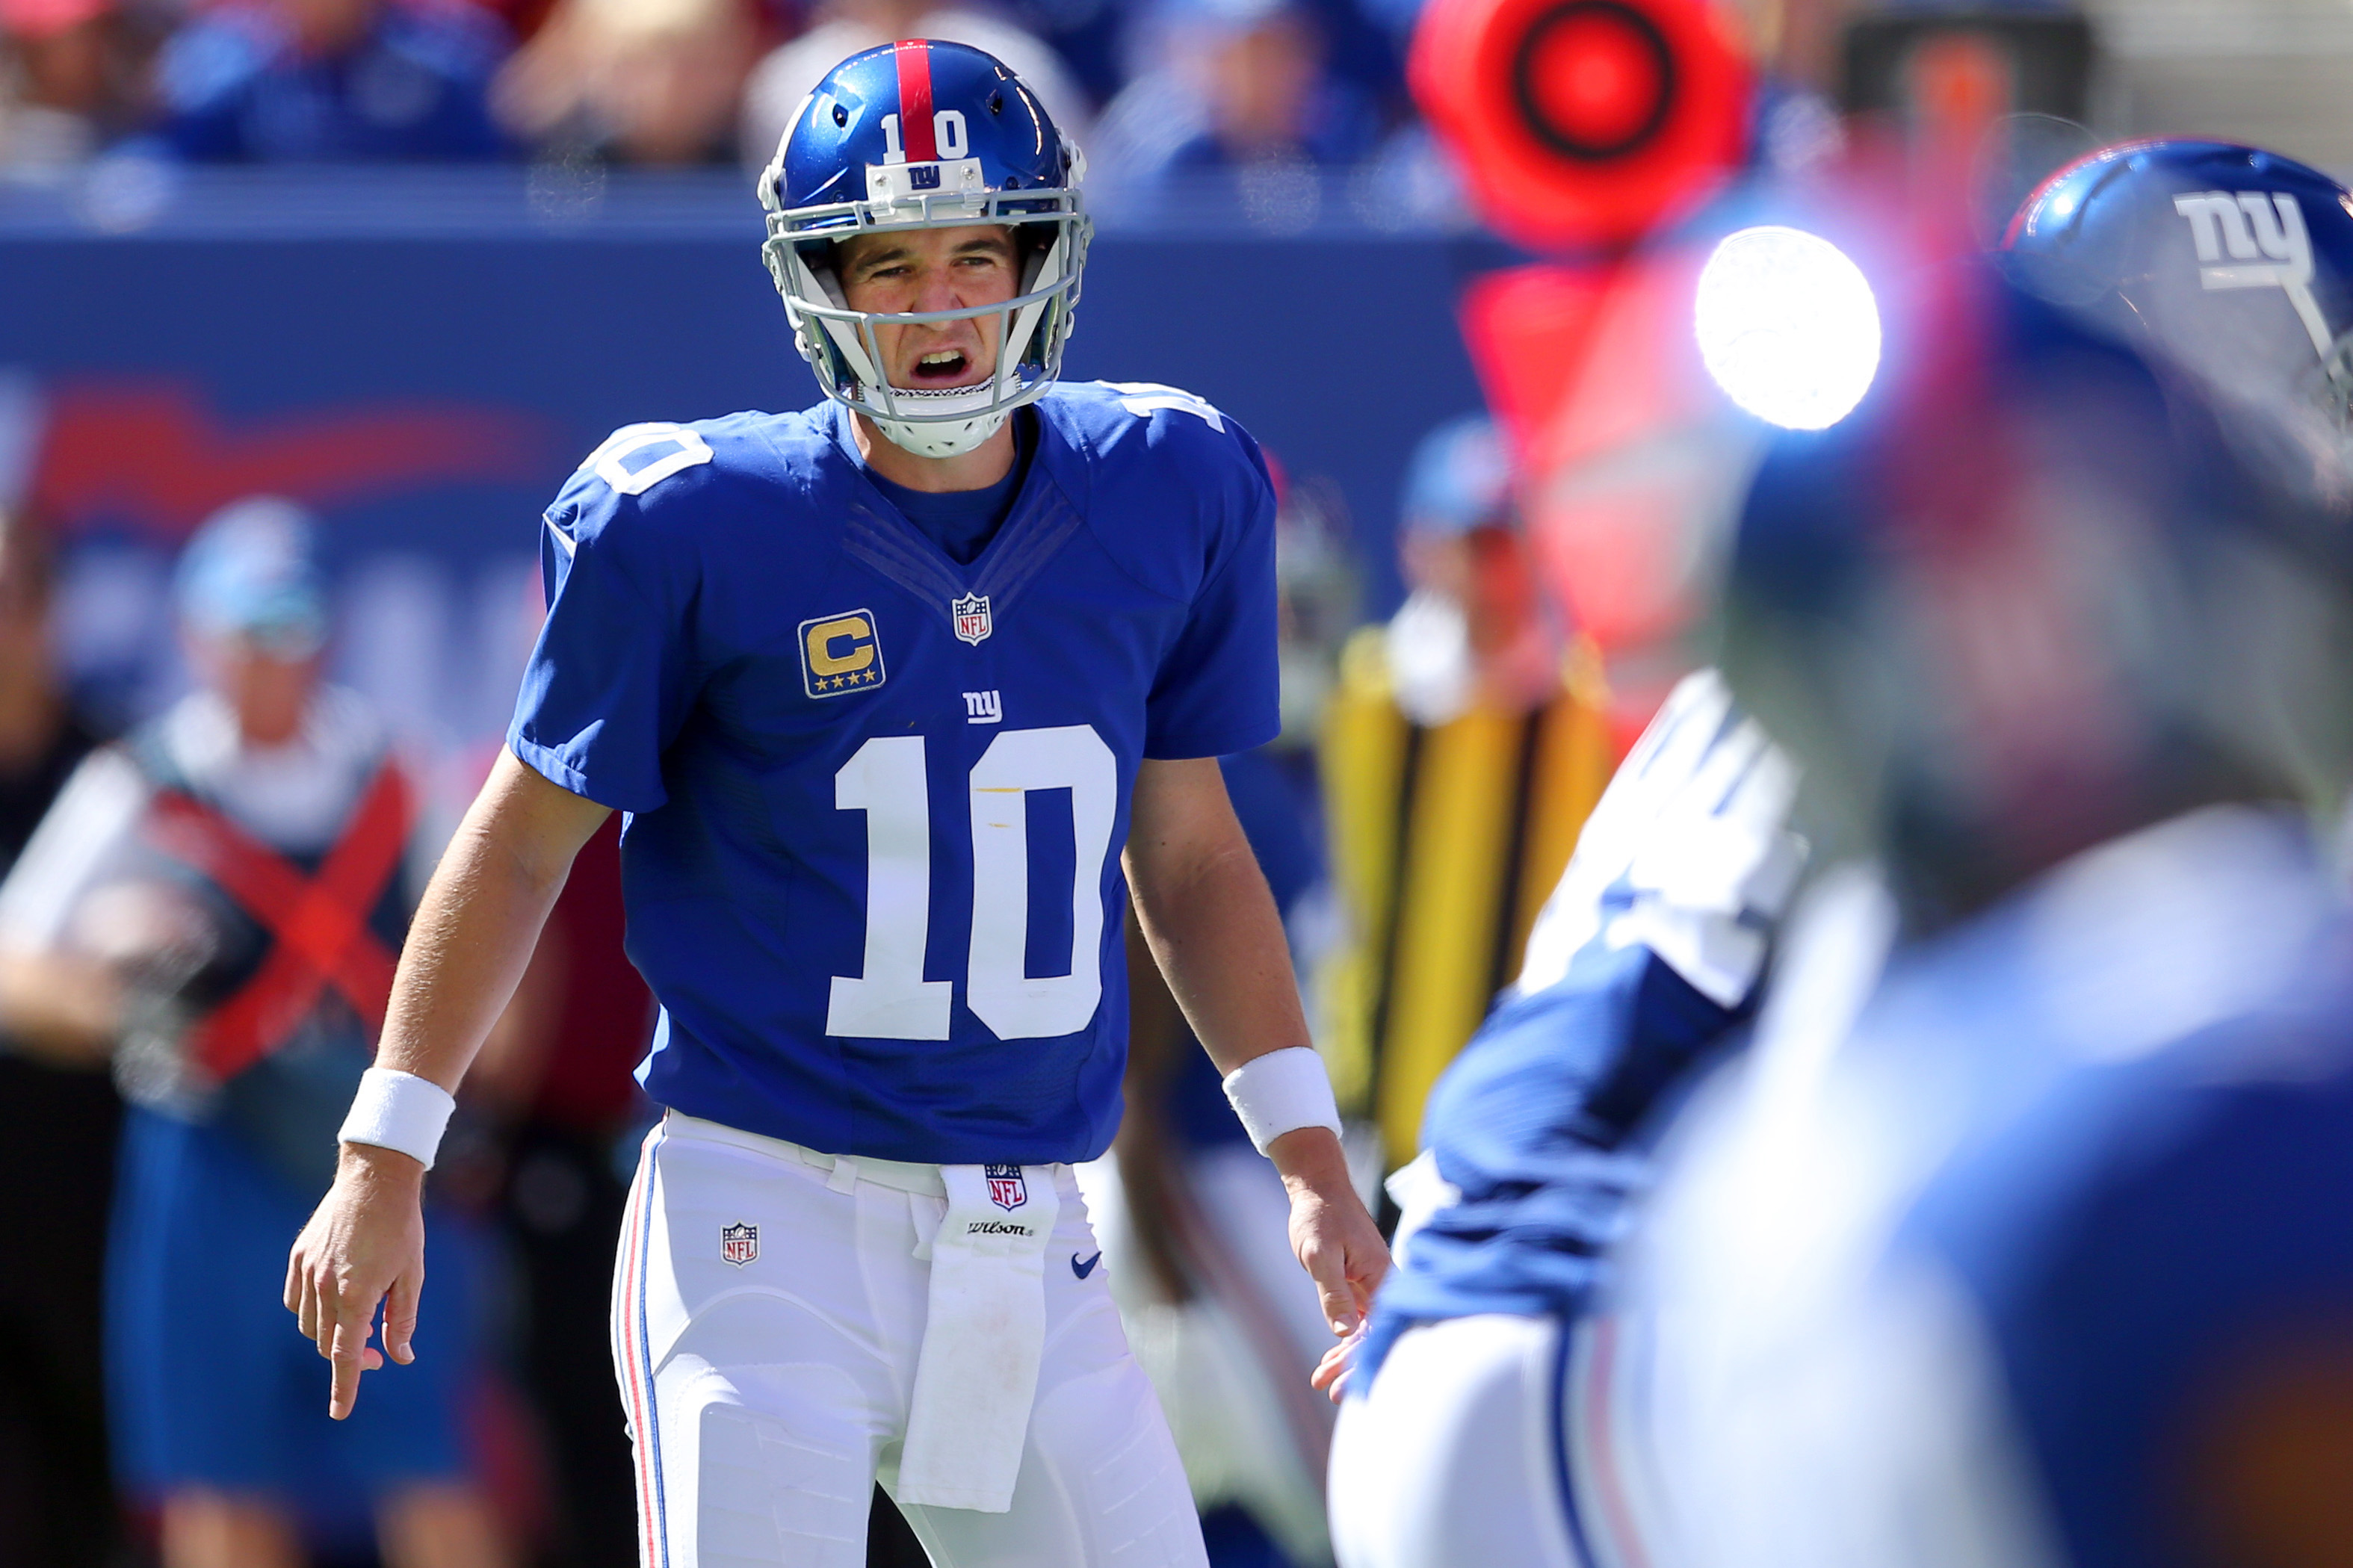 New York Giants Eli Manning Look to Make Statement Against Vikings